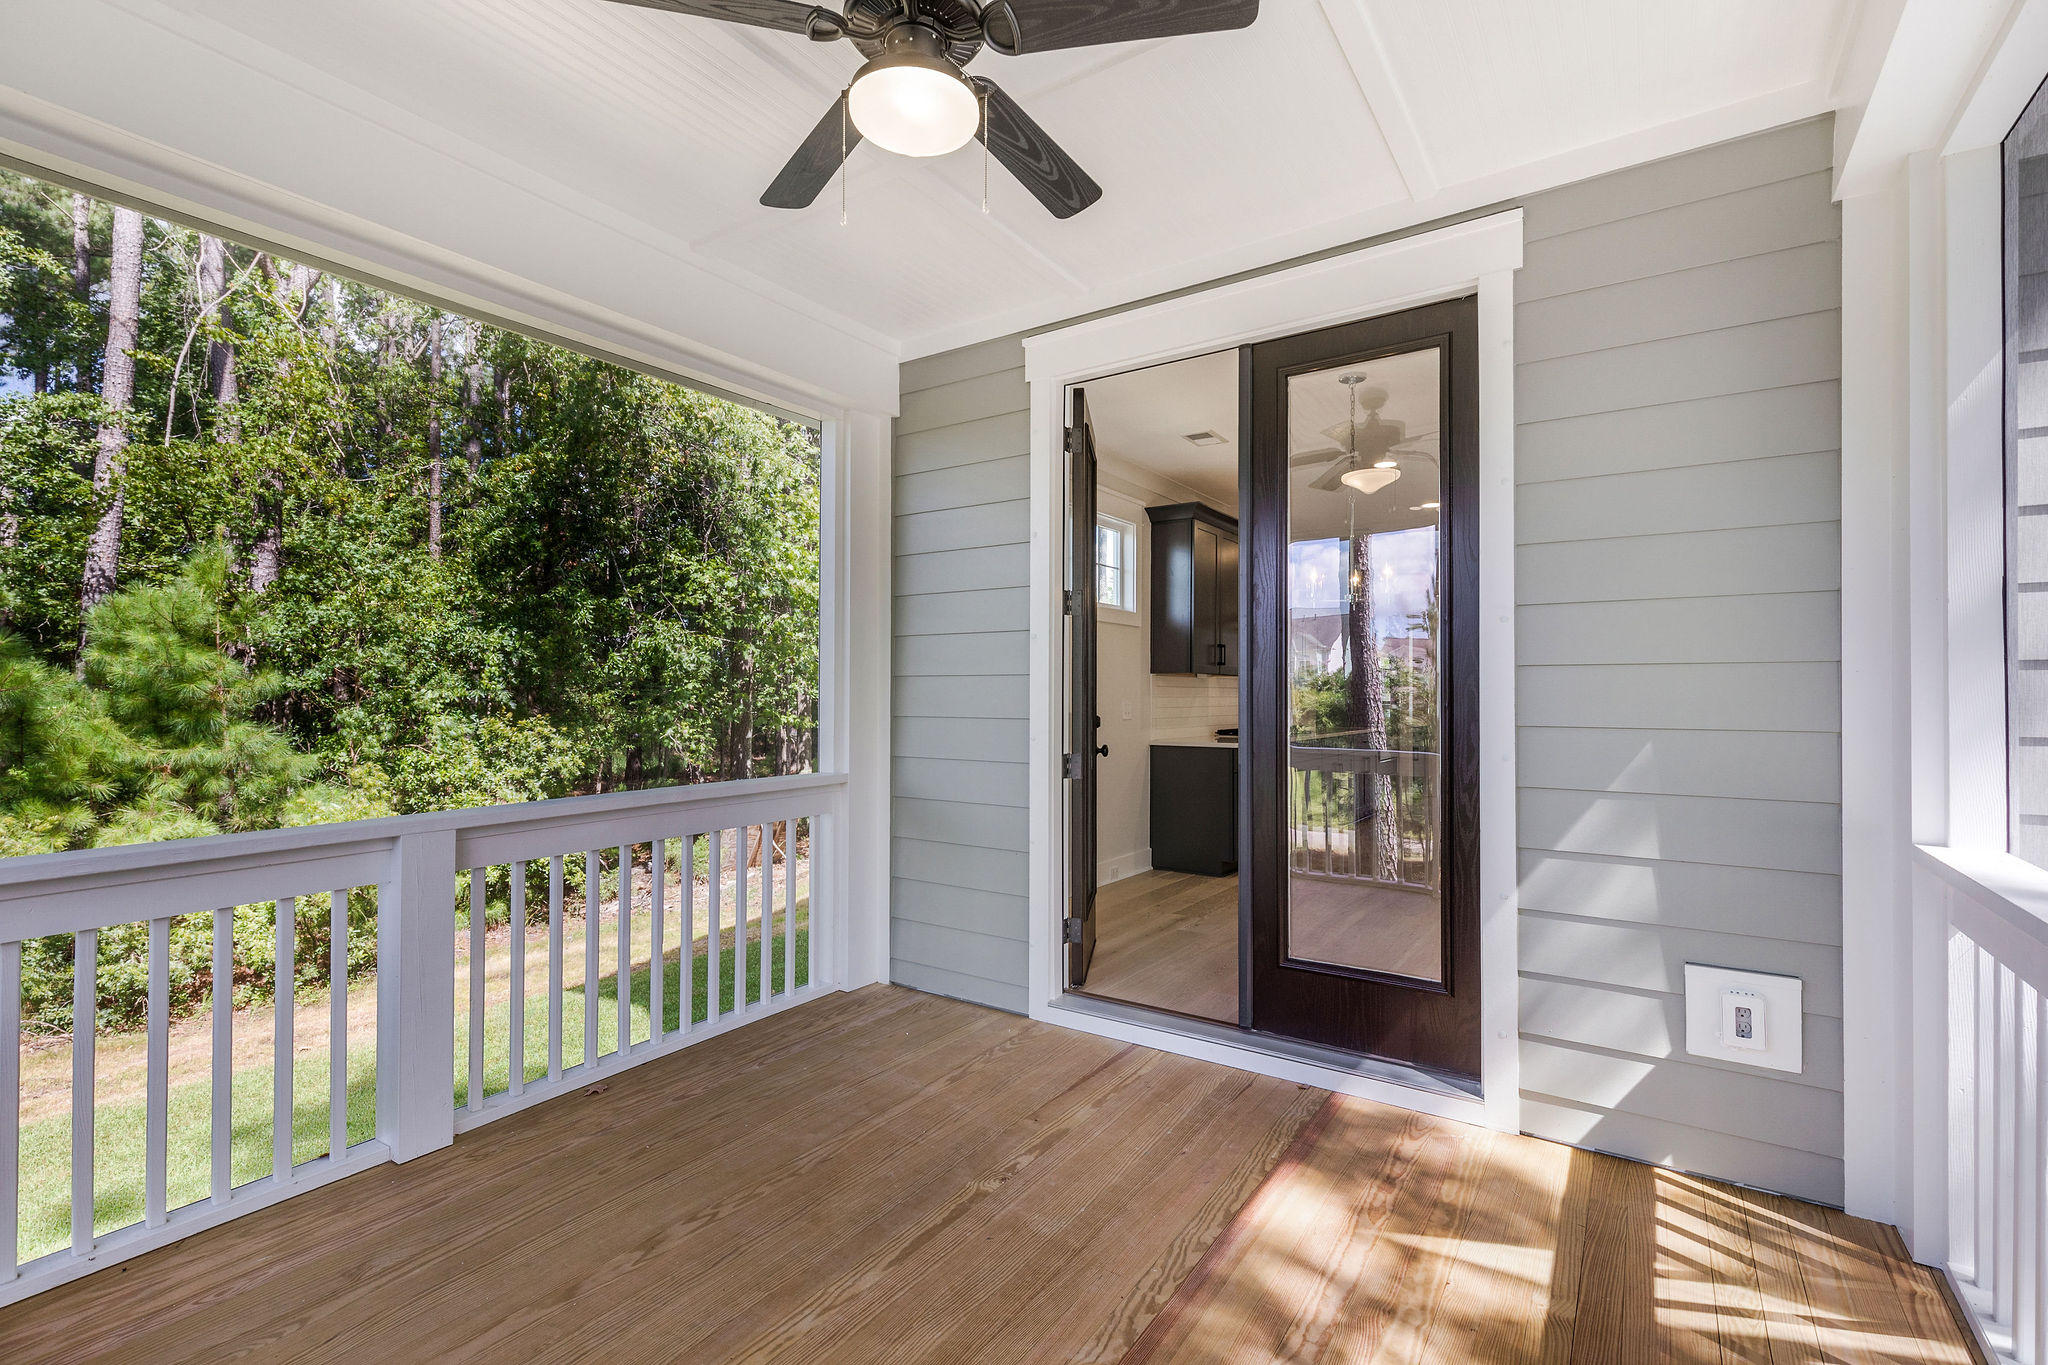 Park West Homes For Sale - 2291 Middlesex, Mount Pleasant, SC - 63